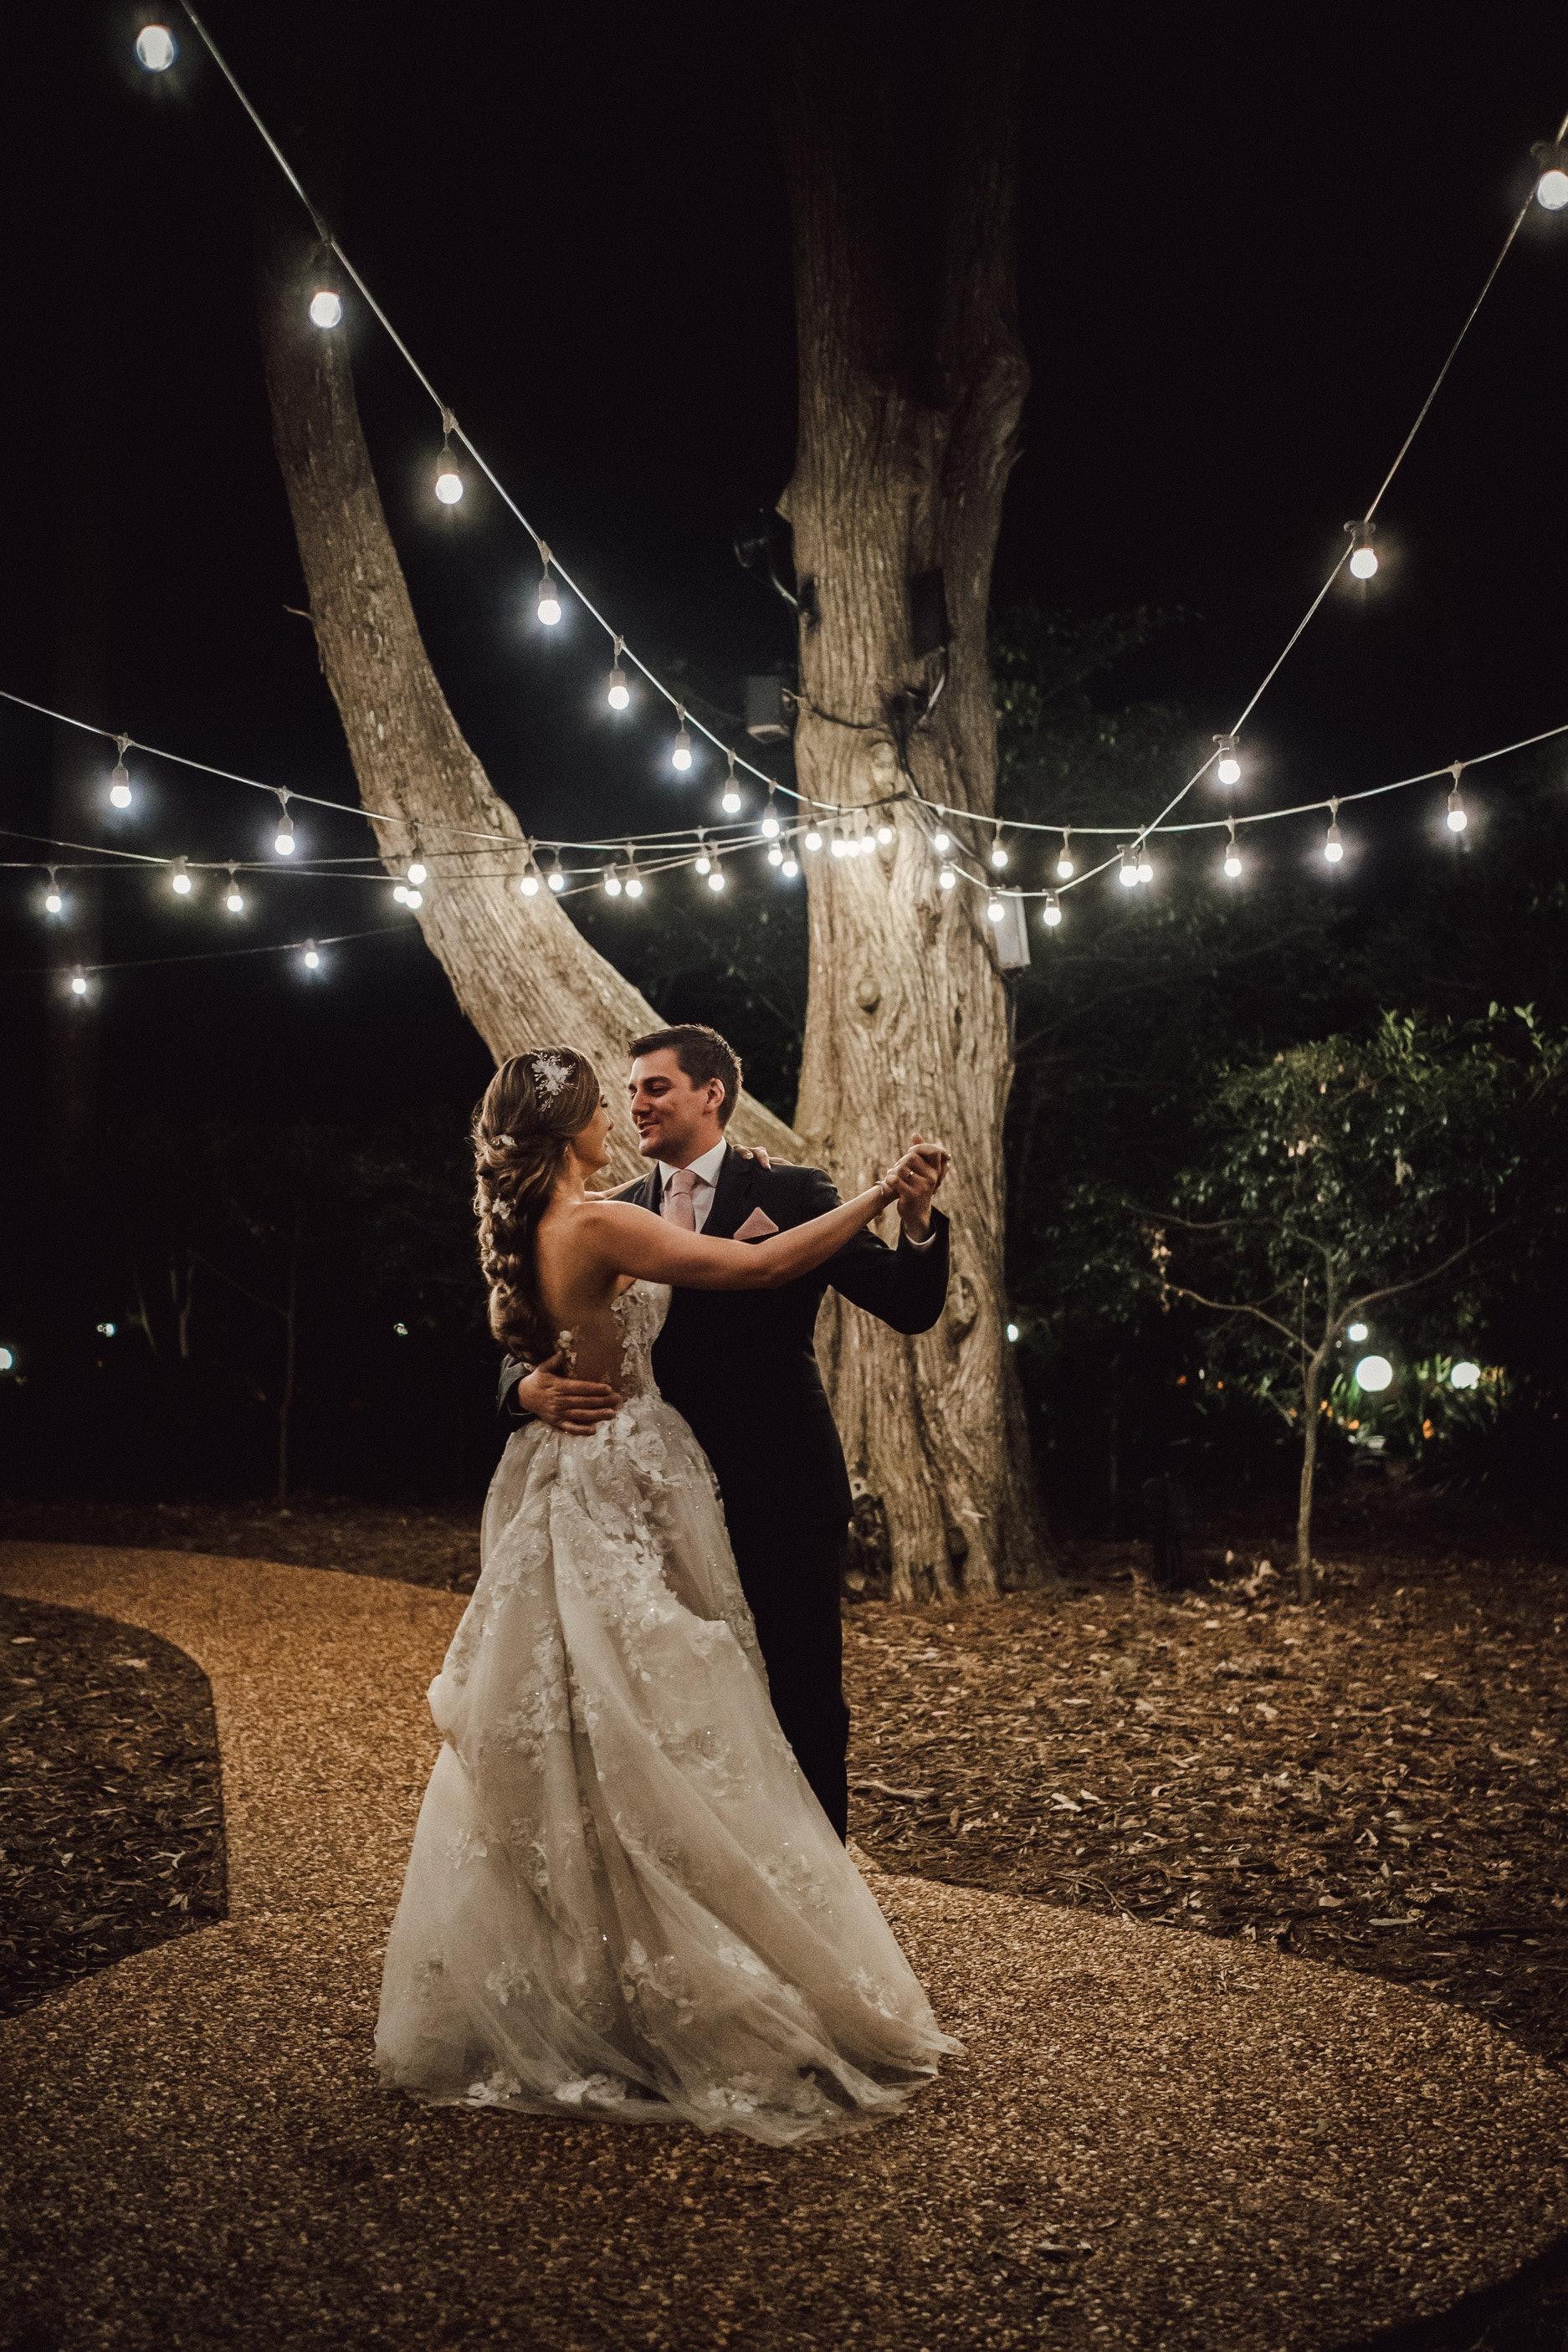 Bride and groom dancing under festoon lights